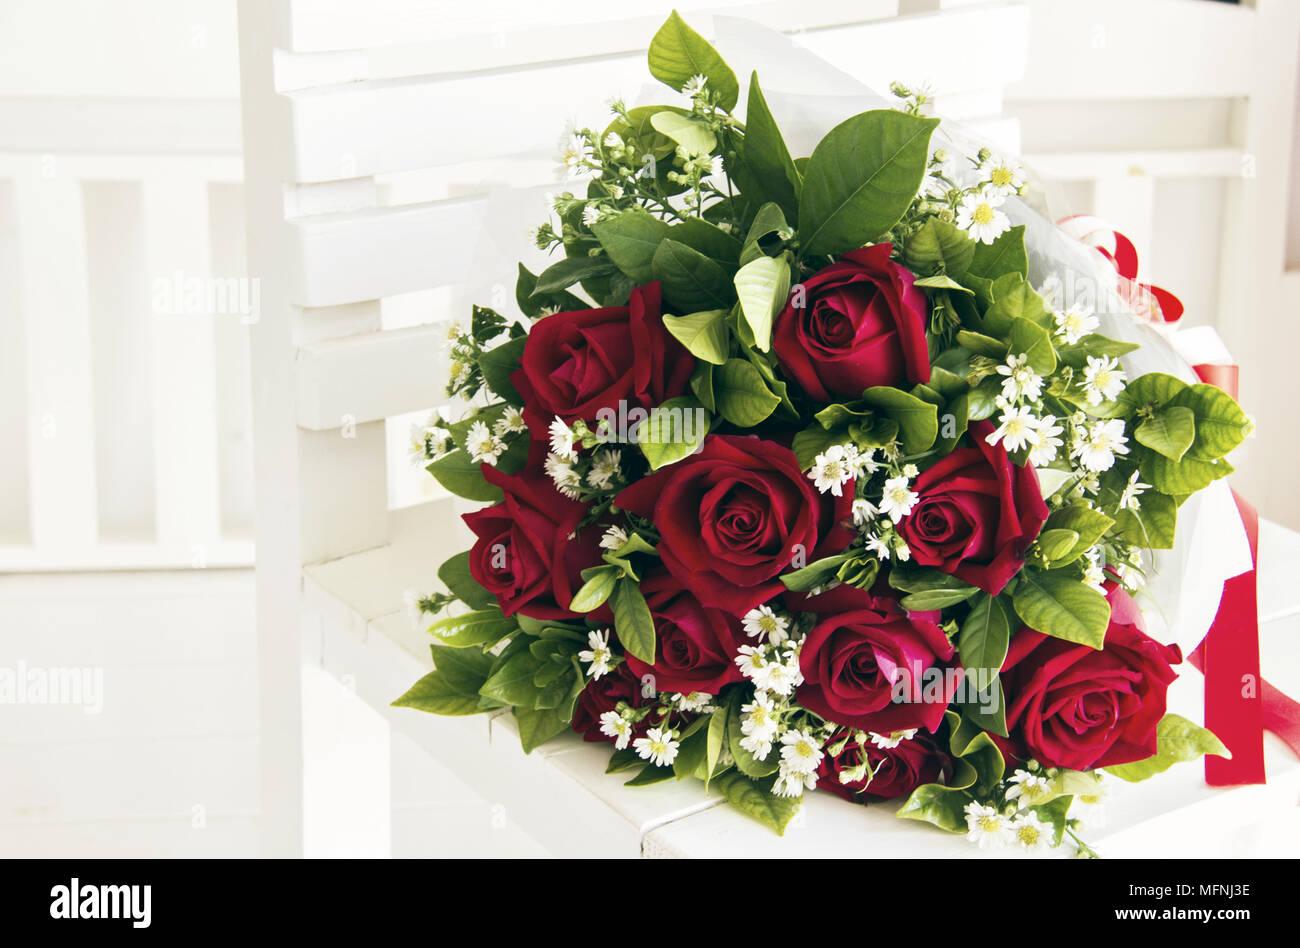 Un Mazzo Di Rose Rosse Sul Bianco Panca In Legno Immagine